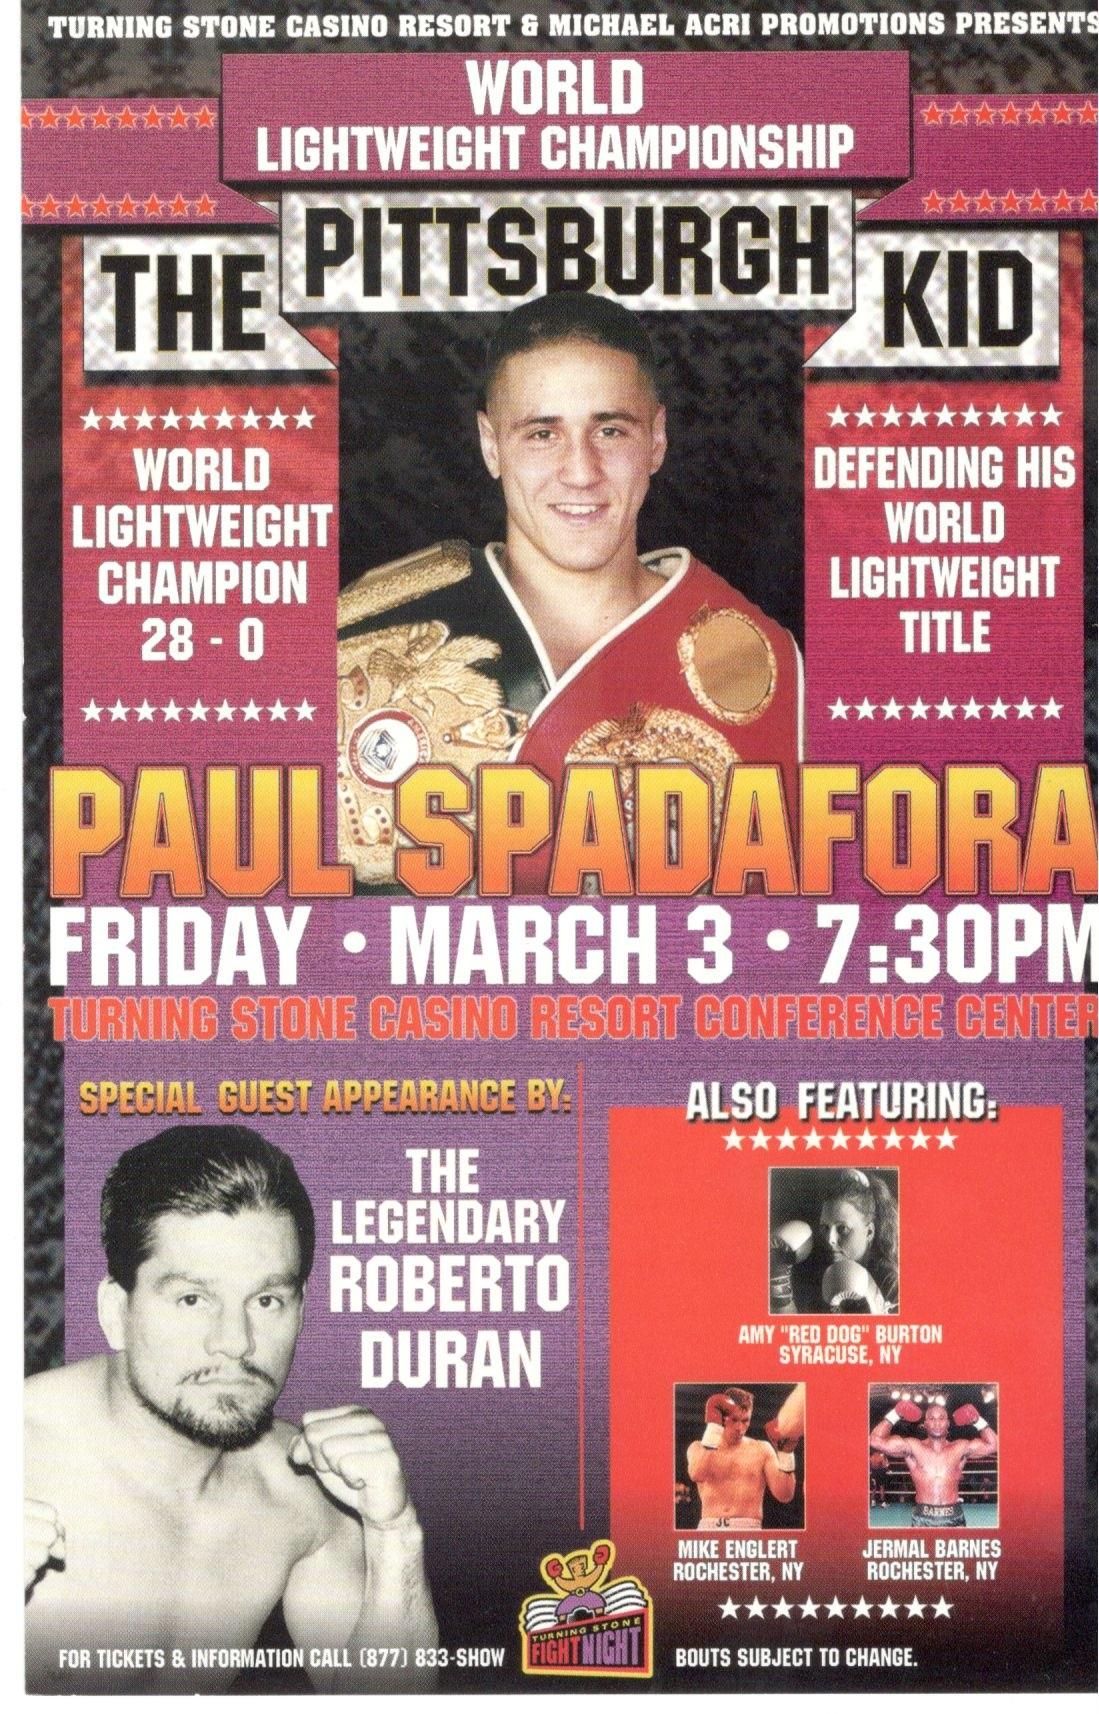 Spadafora and Duran Fight Program